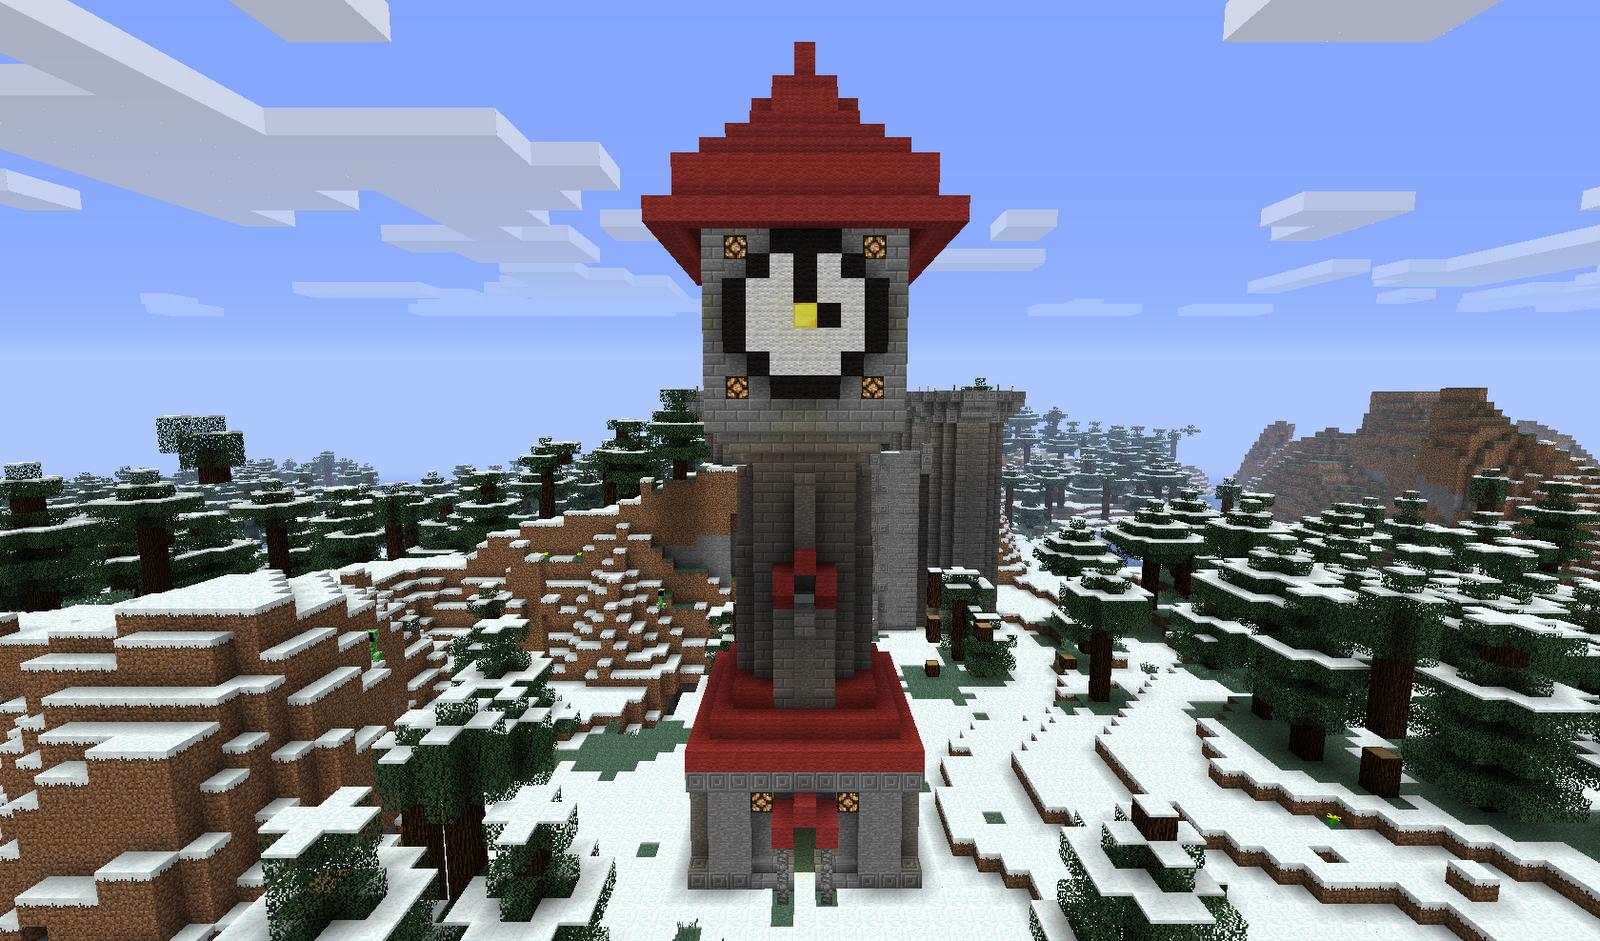 Minecraft Building Ideas: Clock Tower